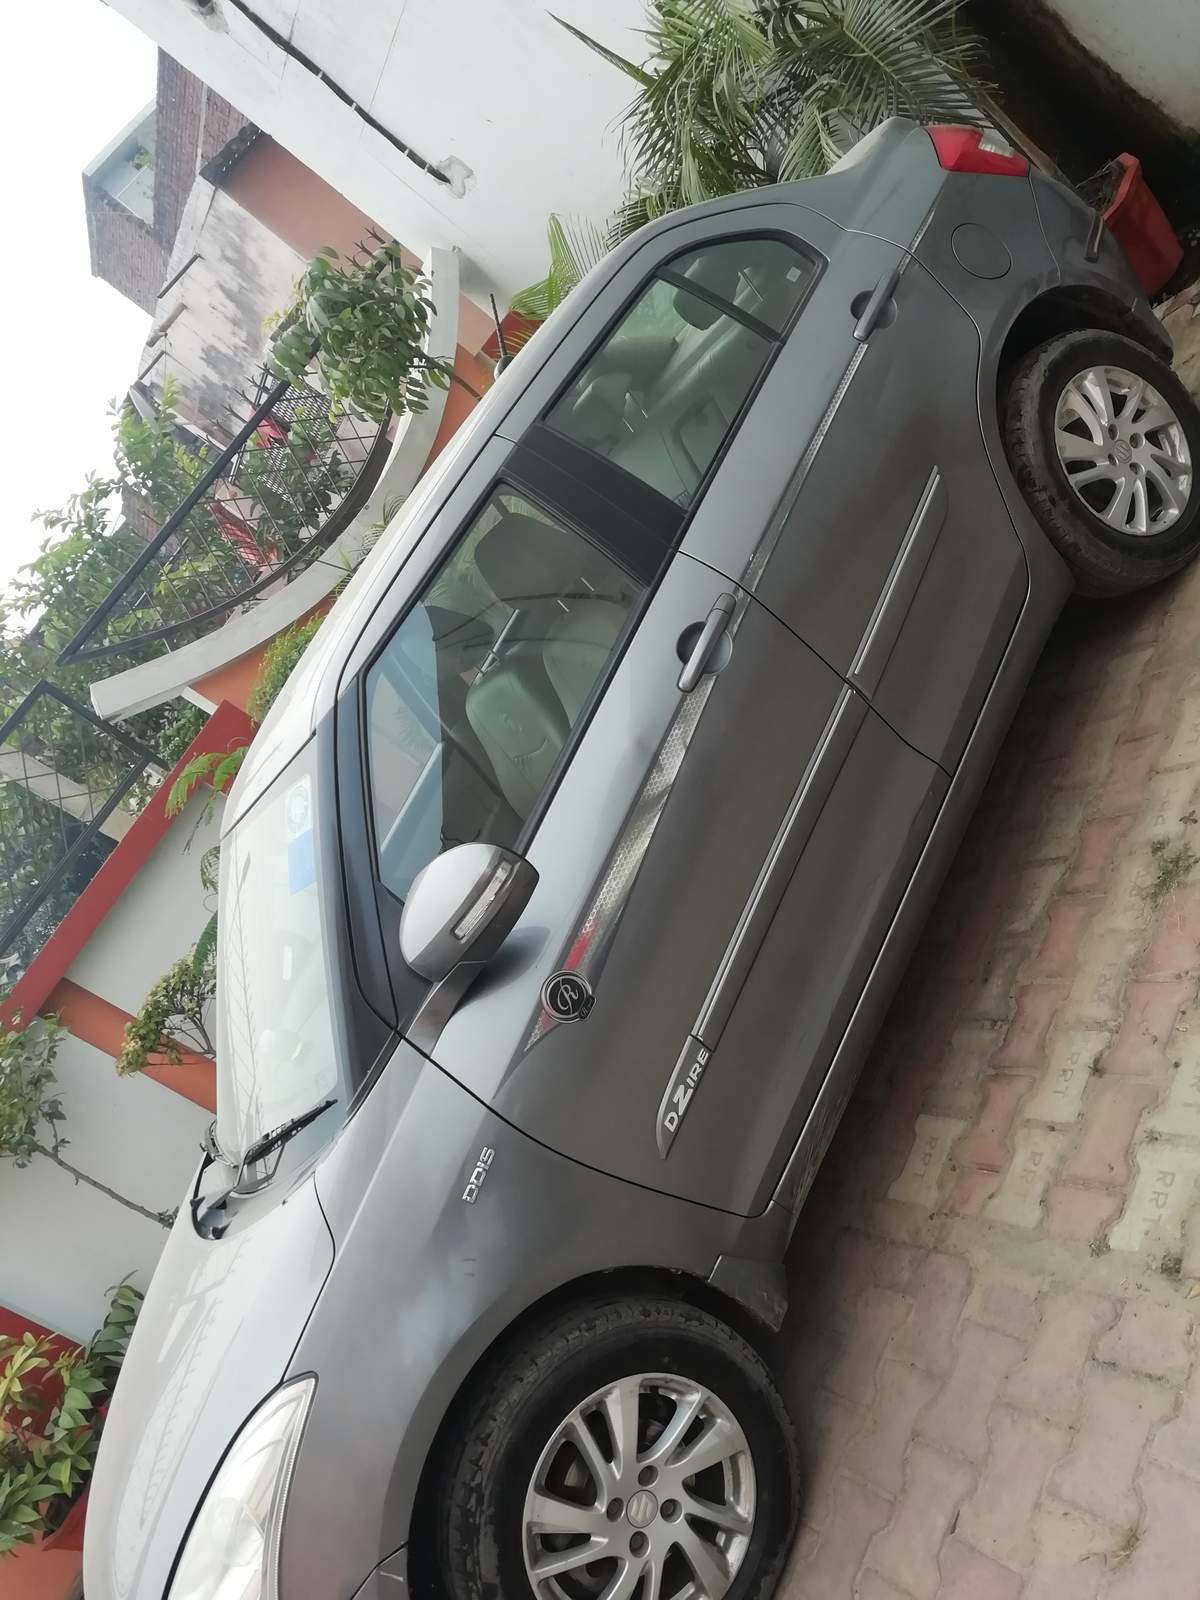 Maruti Suzuki Swift Dzire Rear Left Side Angle View